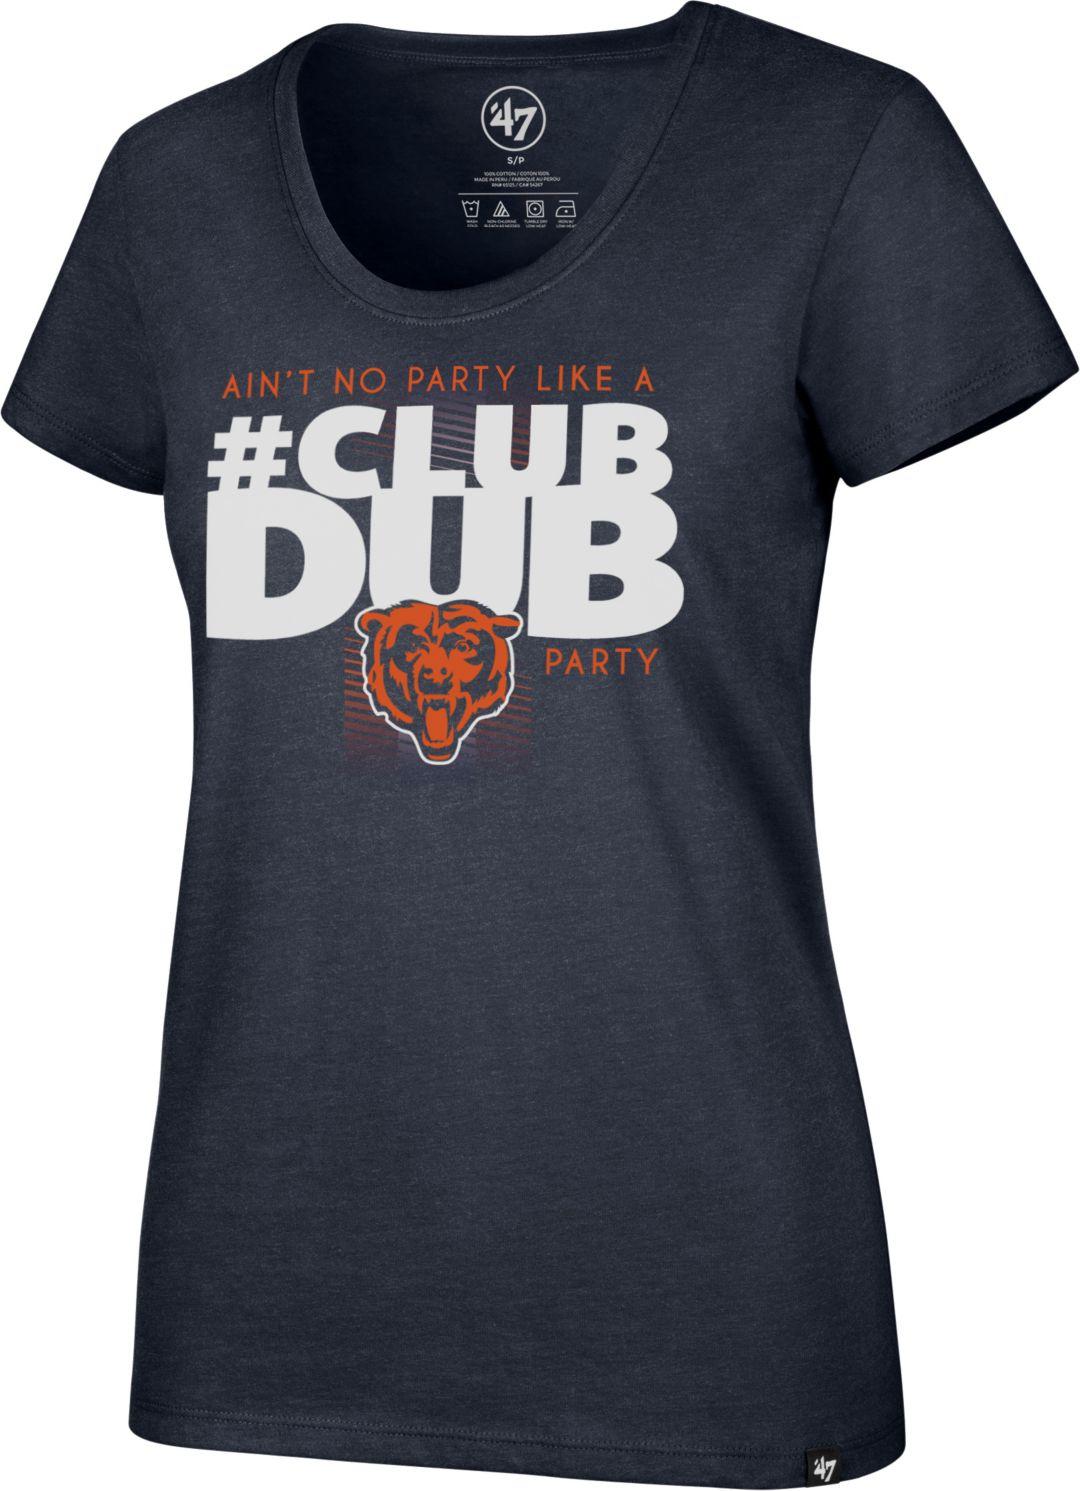 Top 47 Women's Chicago Bears Club Dub Navy T Shirt | DICK'S Sporting Goods